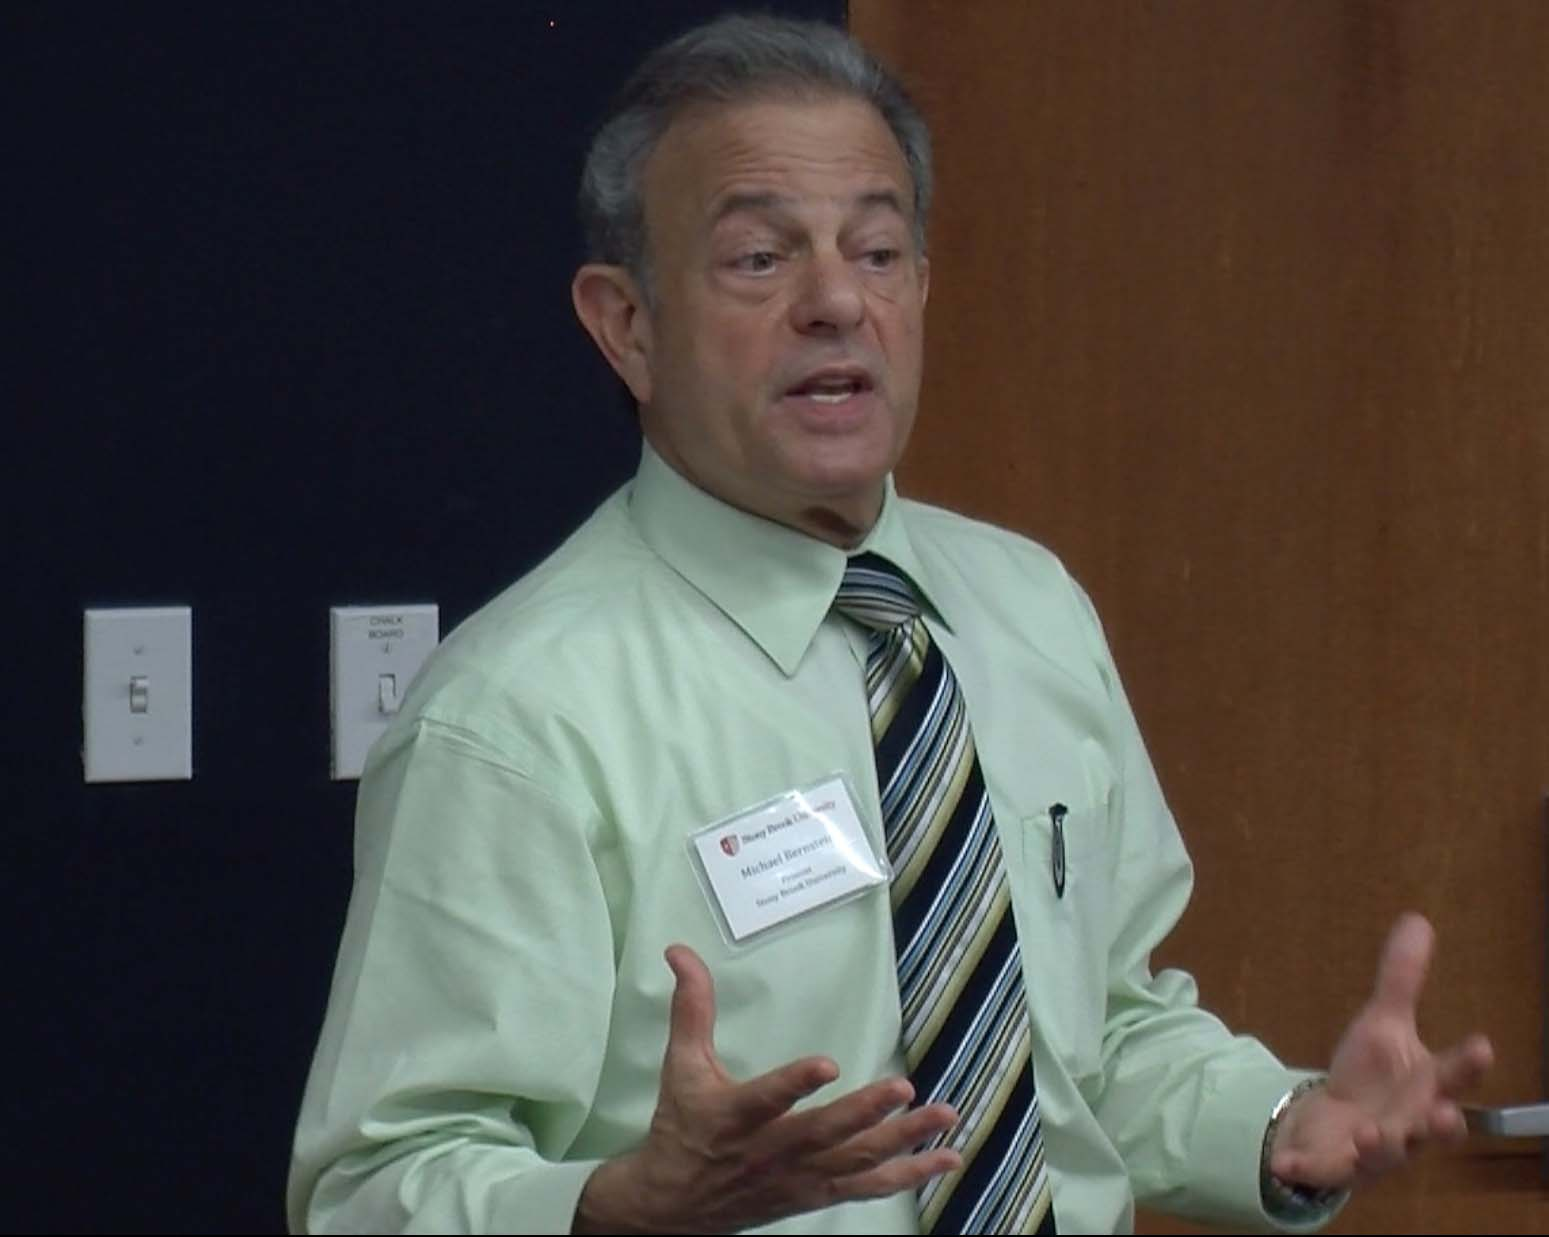 Stony Brook University Provost Michael Bernstein